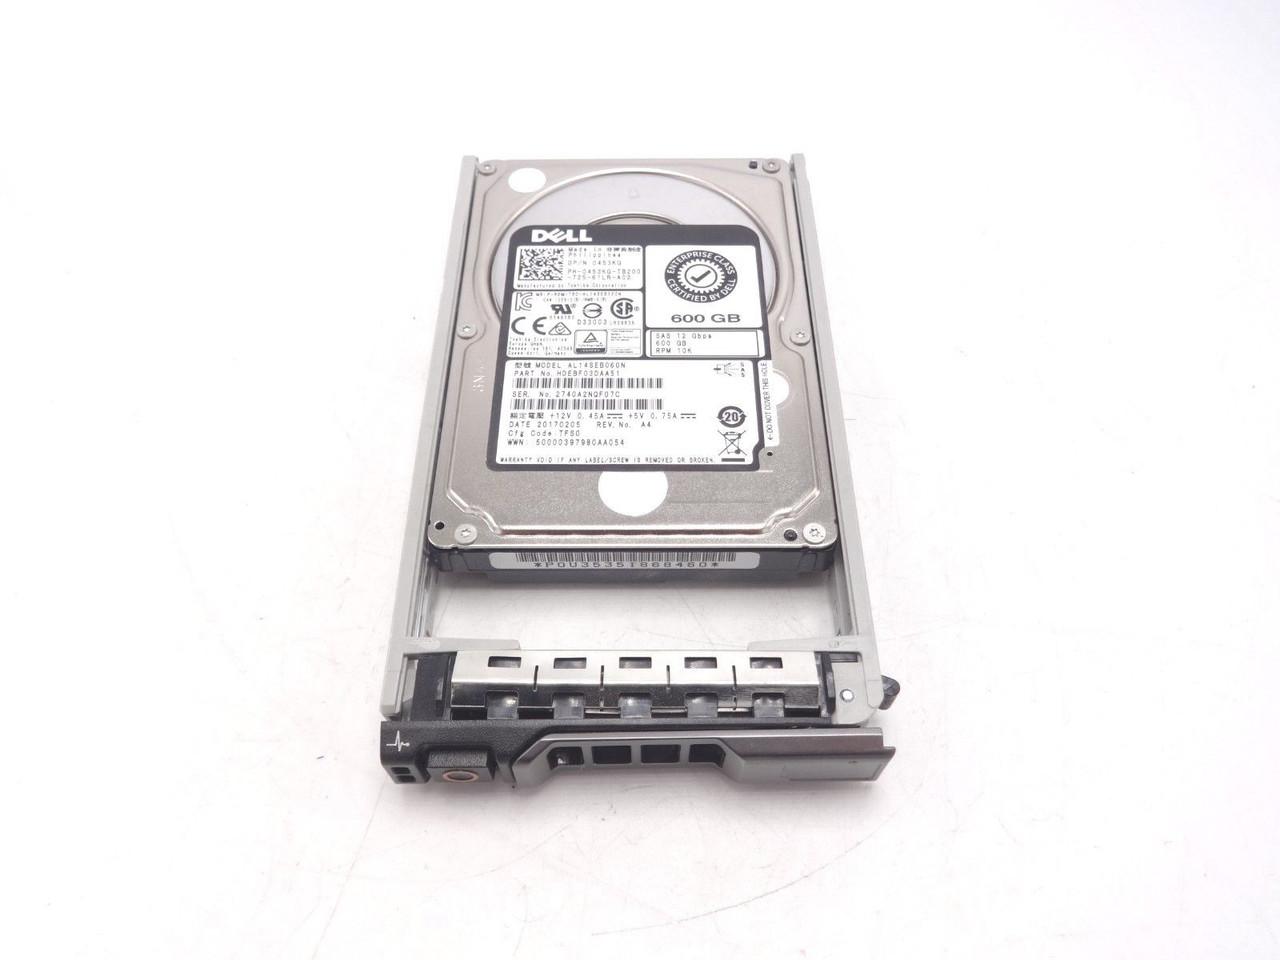 Dell 453KG 600GB 10K 12GBPS 2.5 Hard Drive